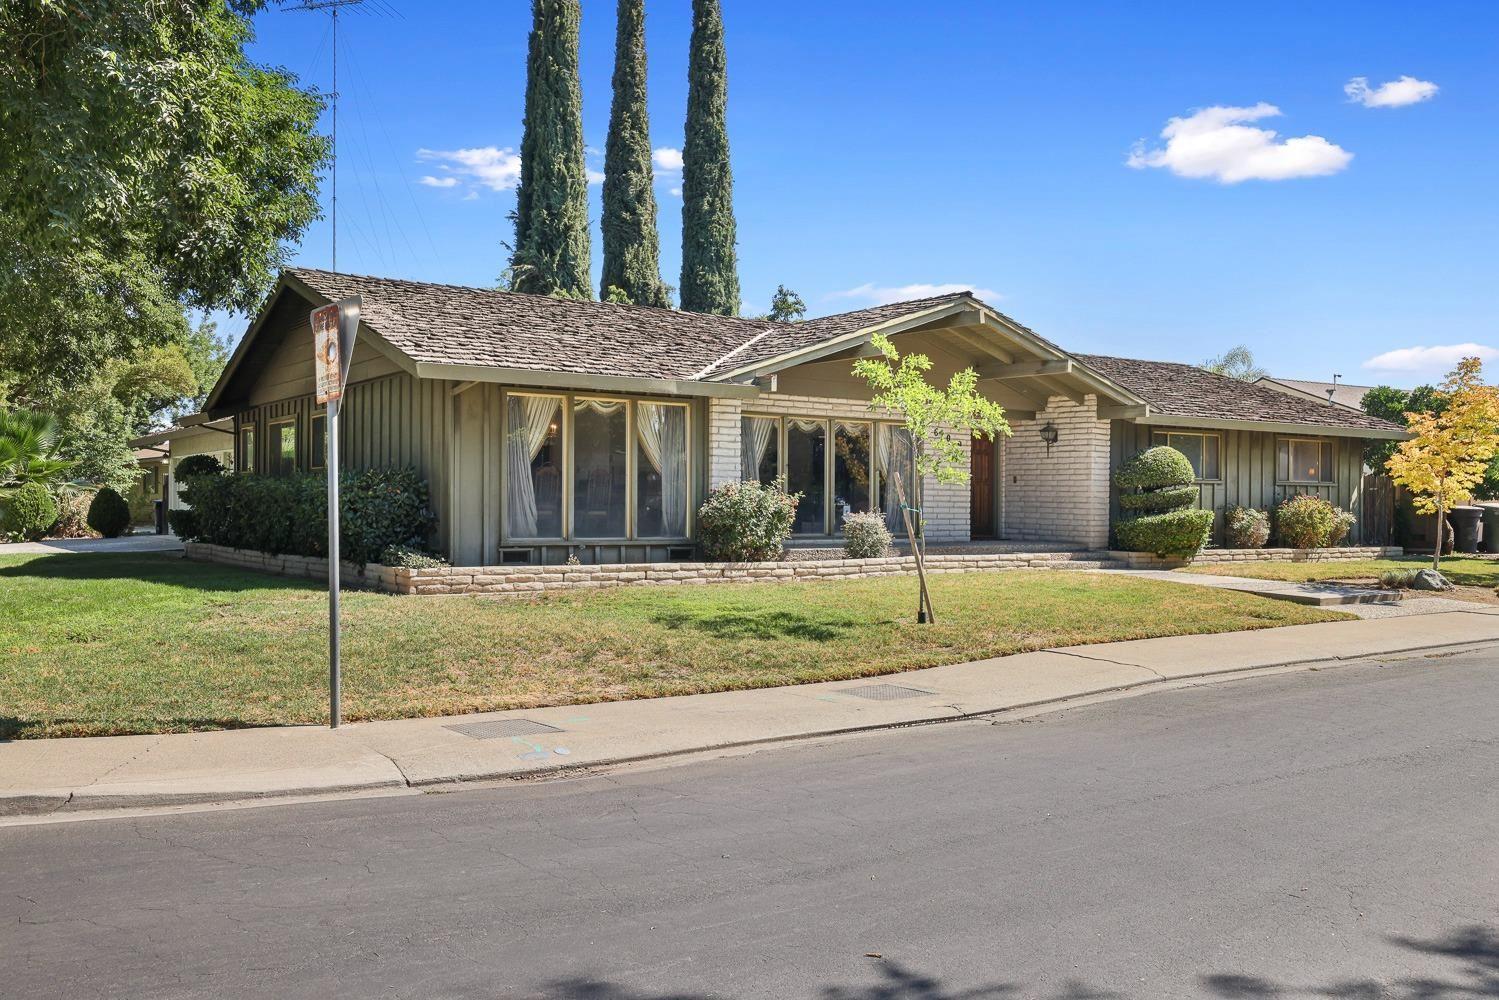 Photo of 609 Andover Lane, Modesto, CA 95350 (MLS # 221080275)